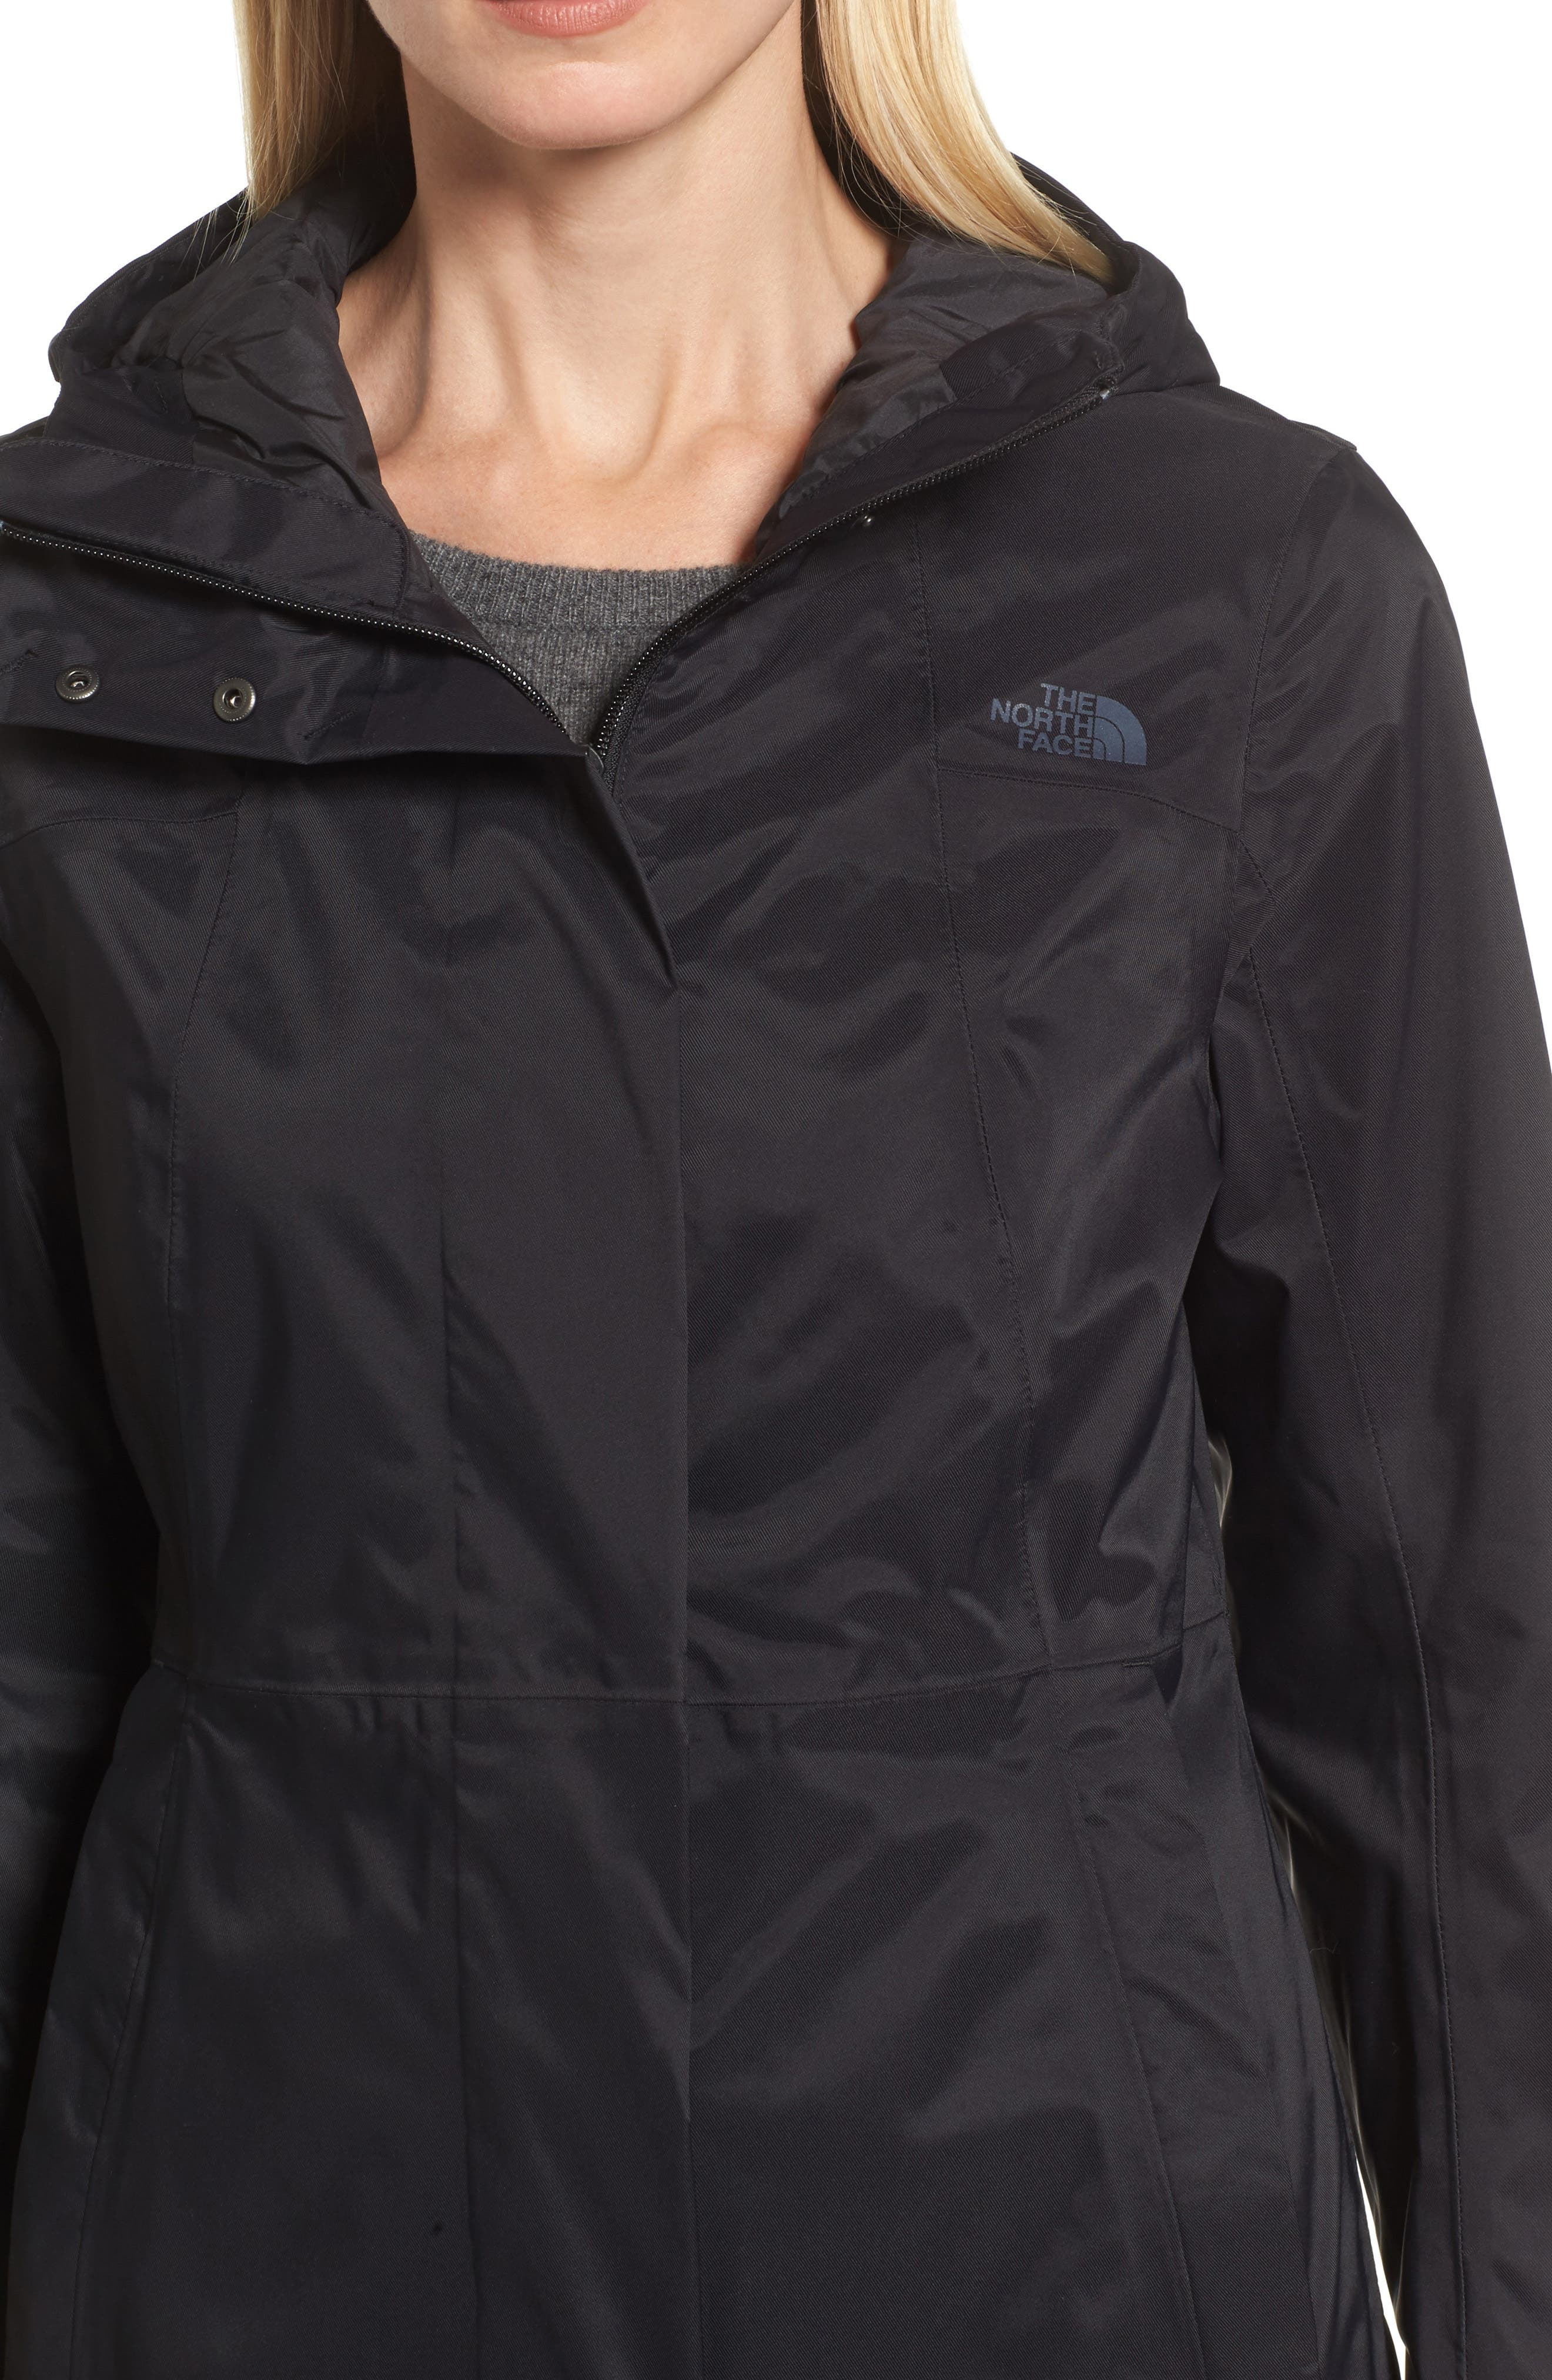 City Midi Trench Coat,                             Alternate thumbnail 4, color,                             TNF BLACK